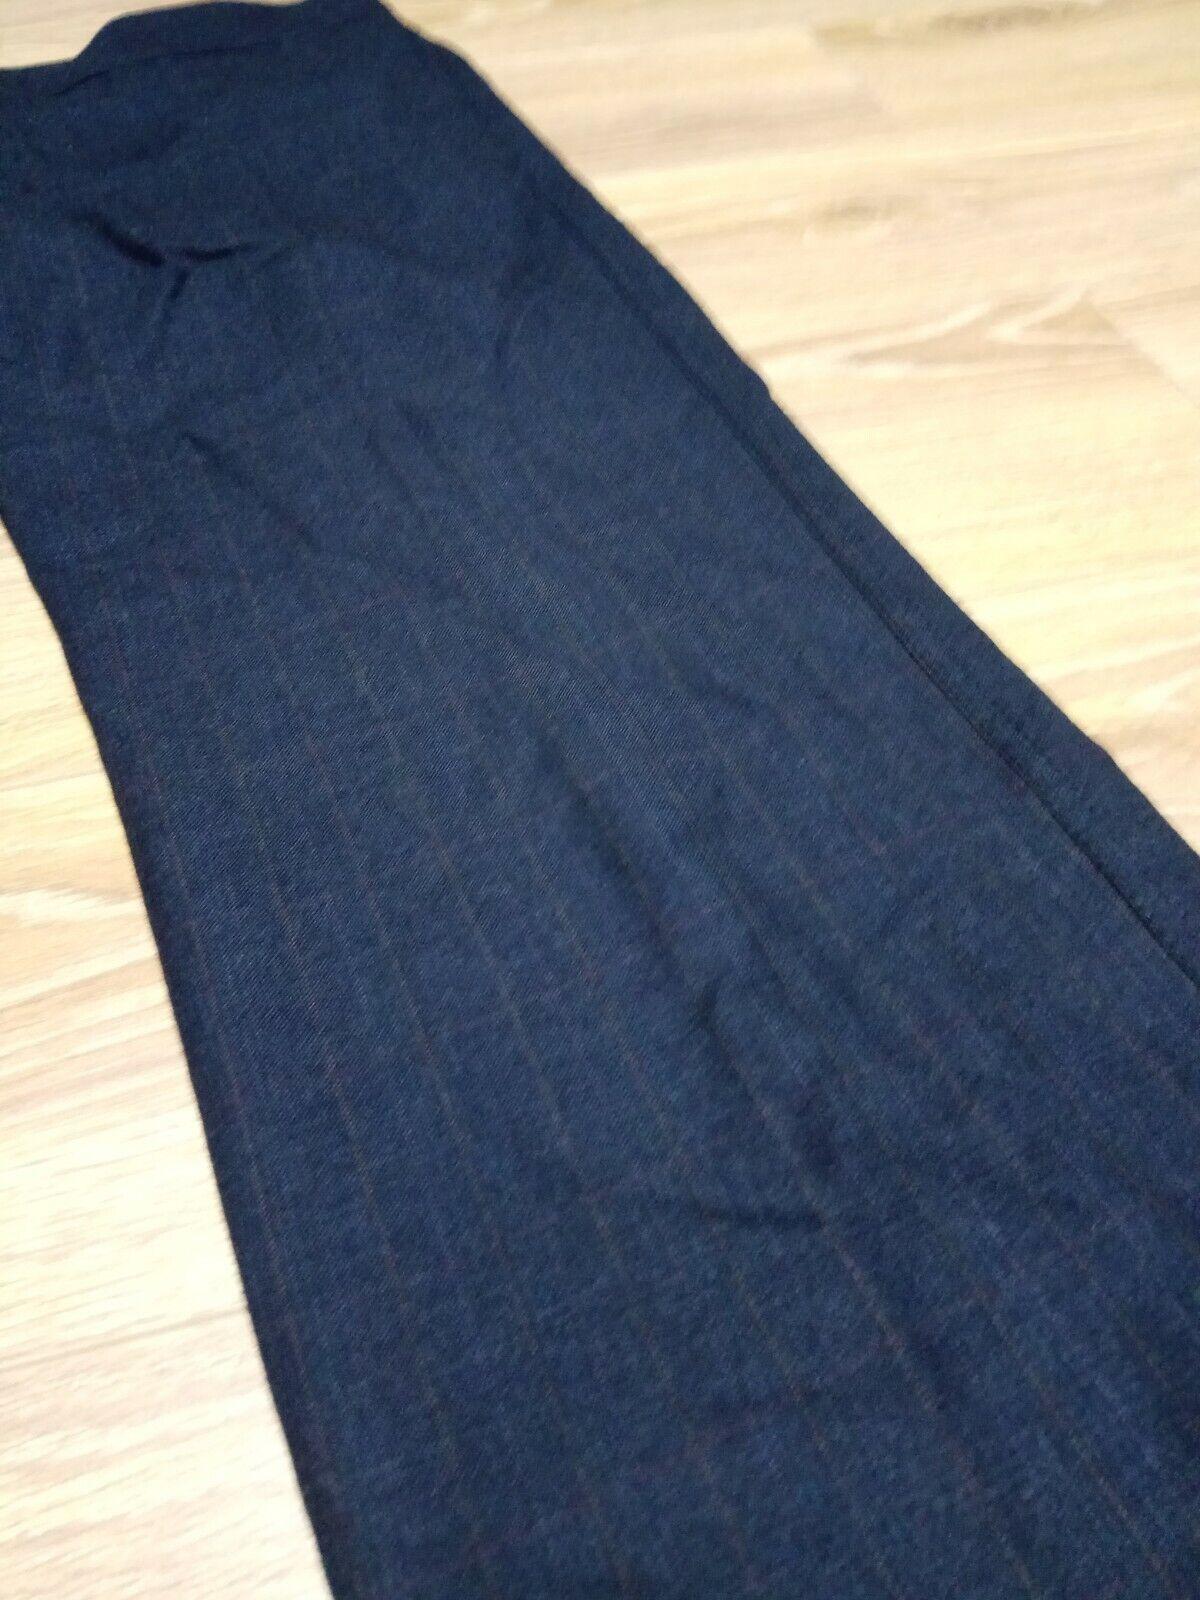 Hugo Boss James Black/grey Wool Dress Pants Micro… - image 3